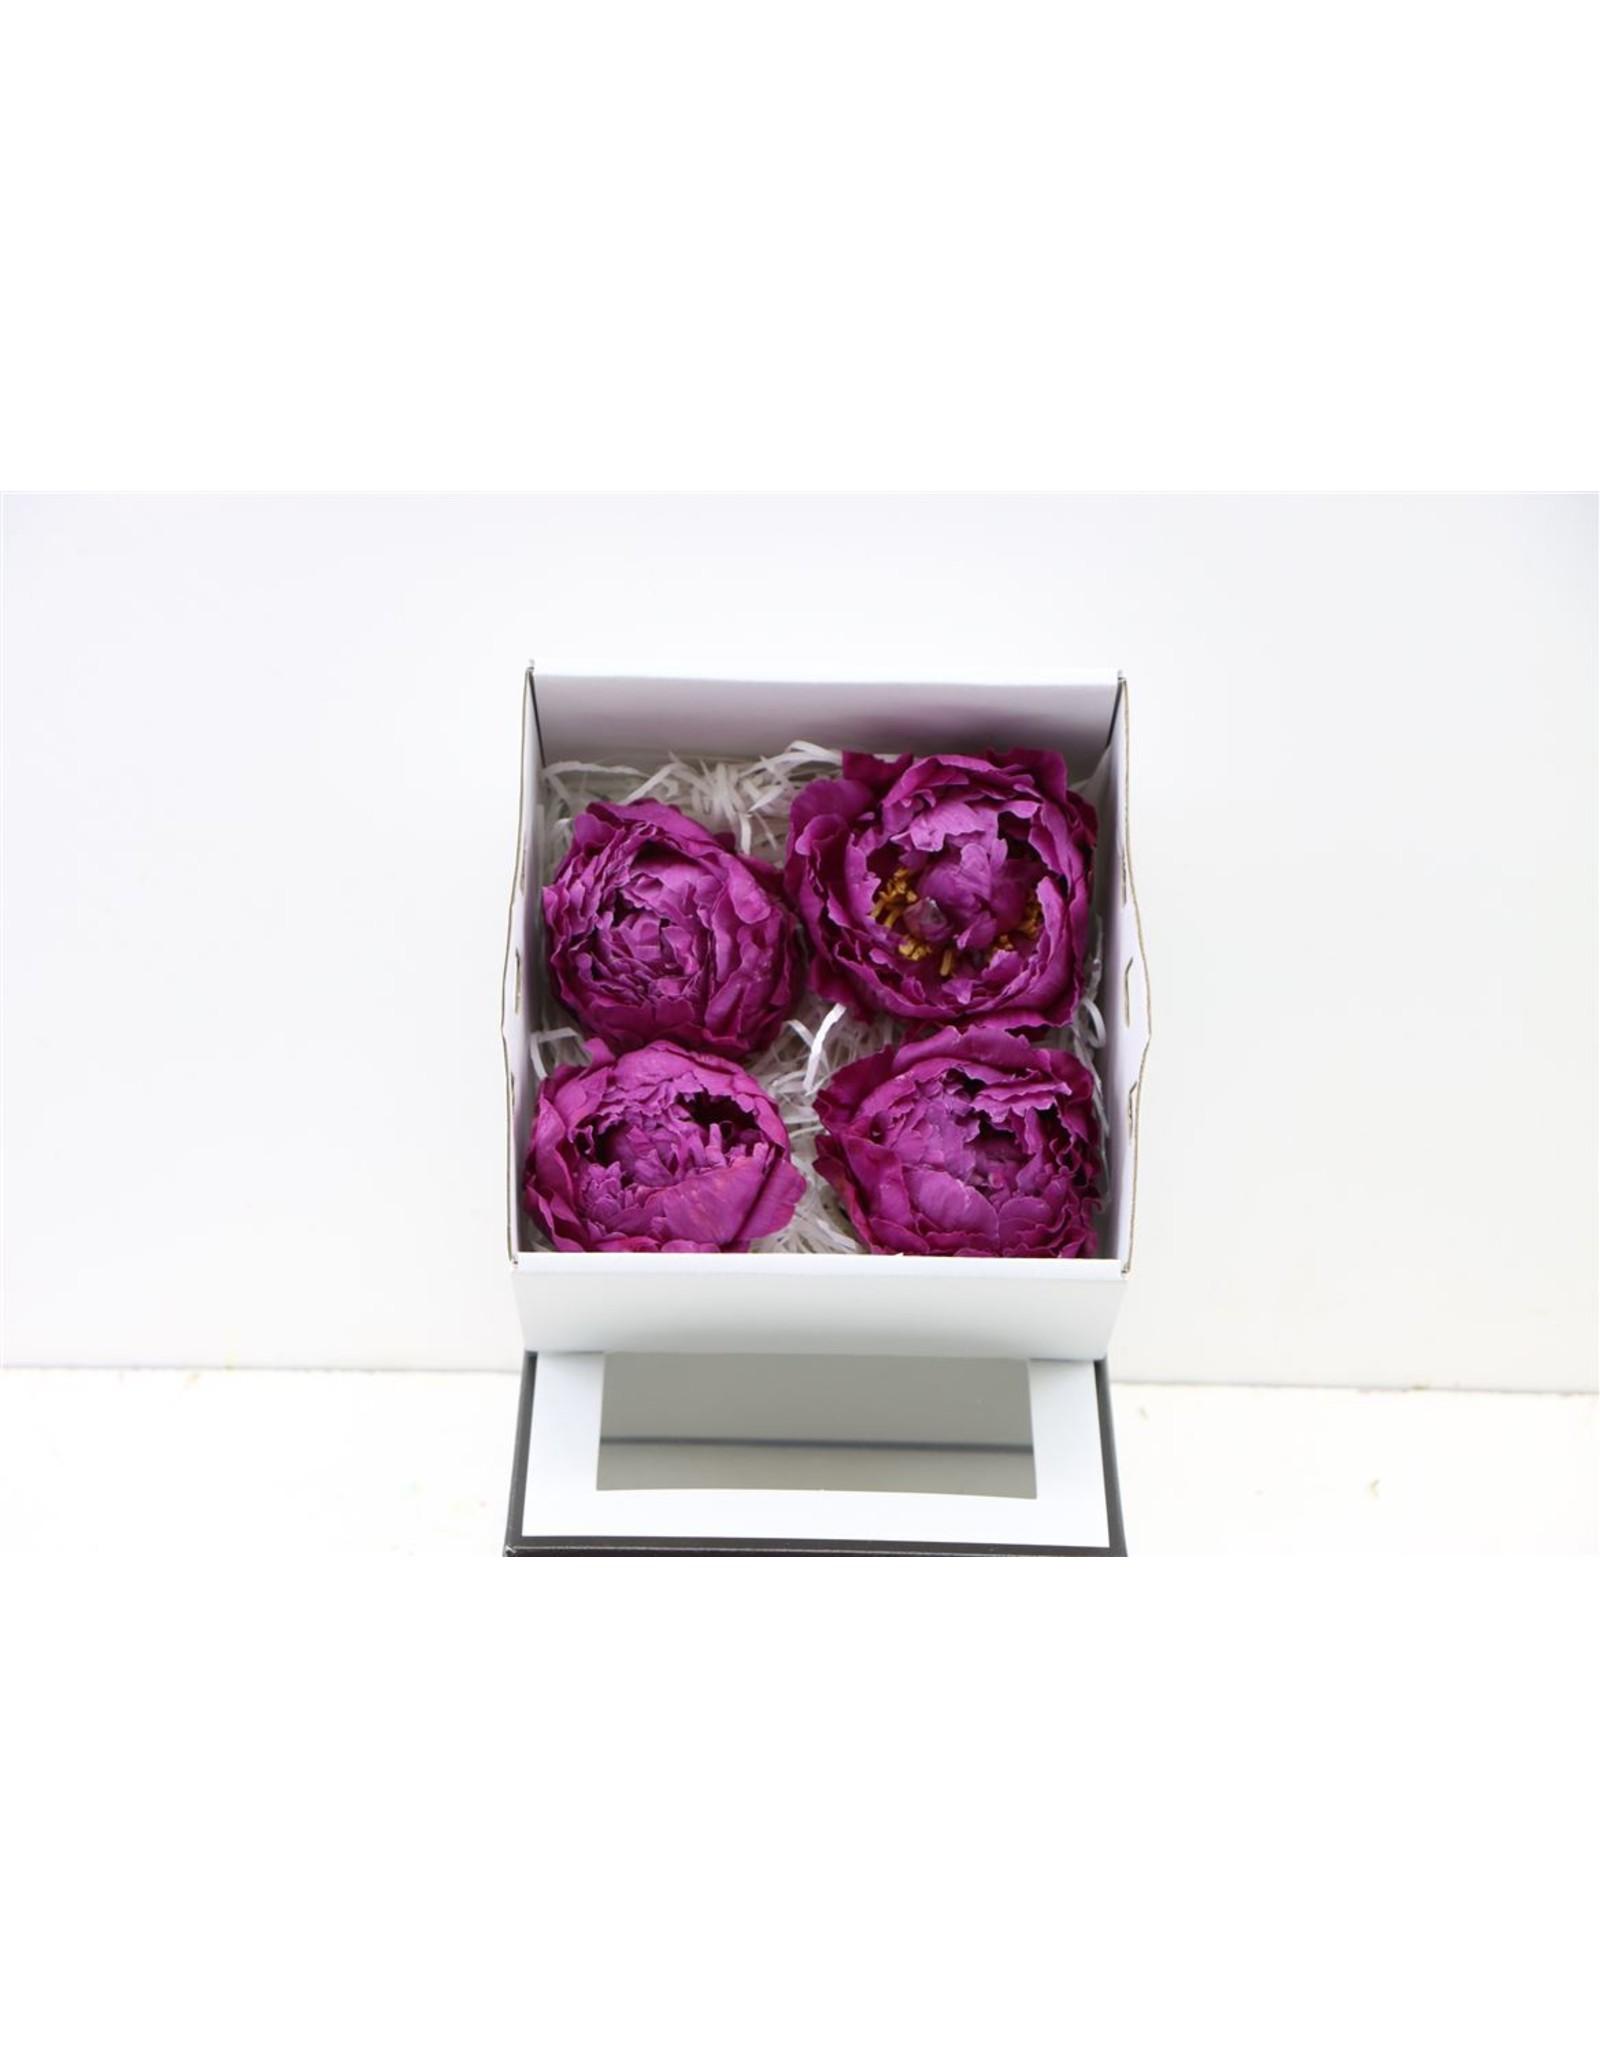 GF Peony Freeze Dried Bordeaux 4pc Box x 4